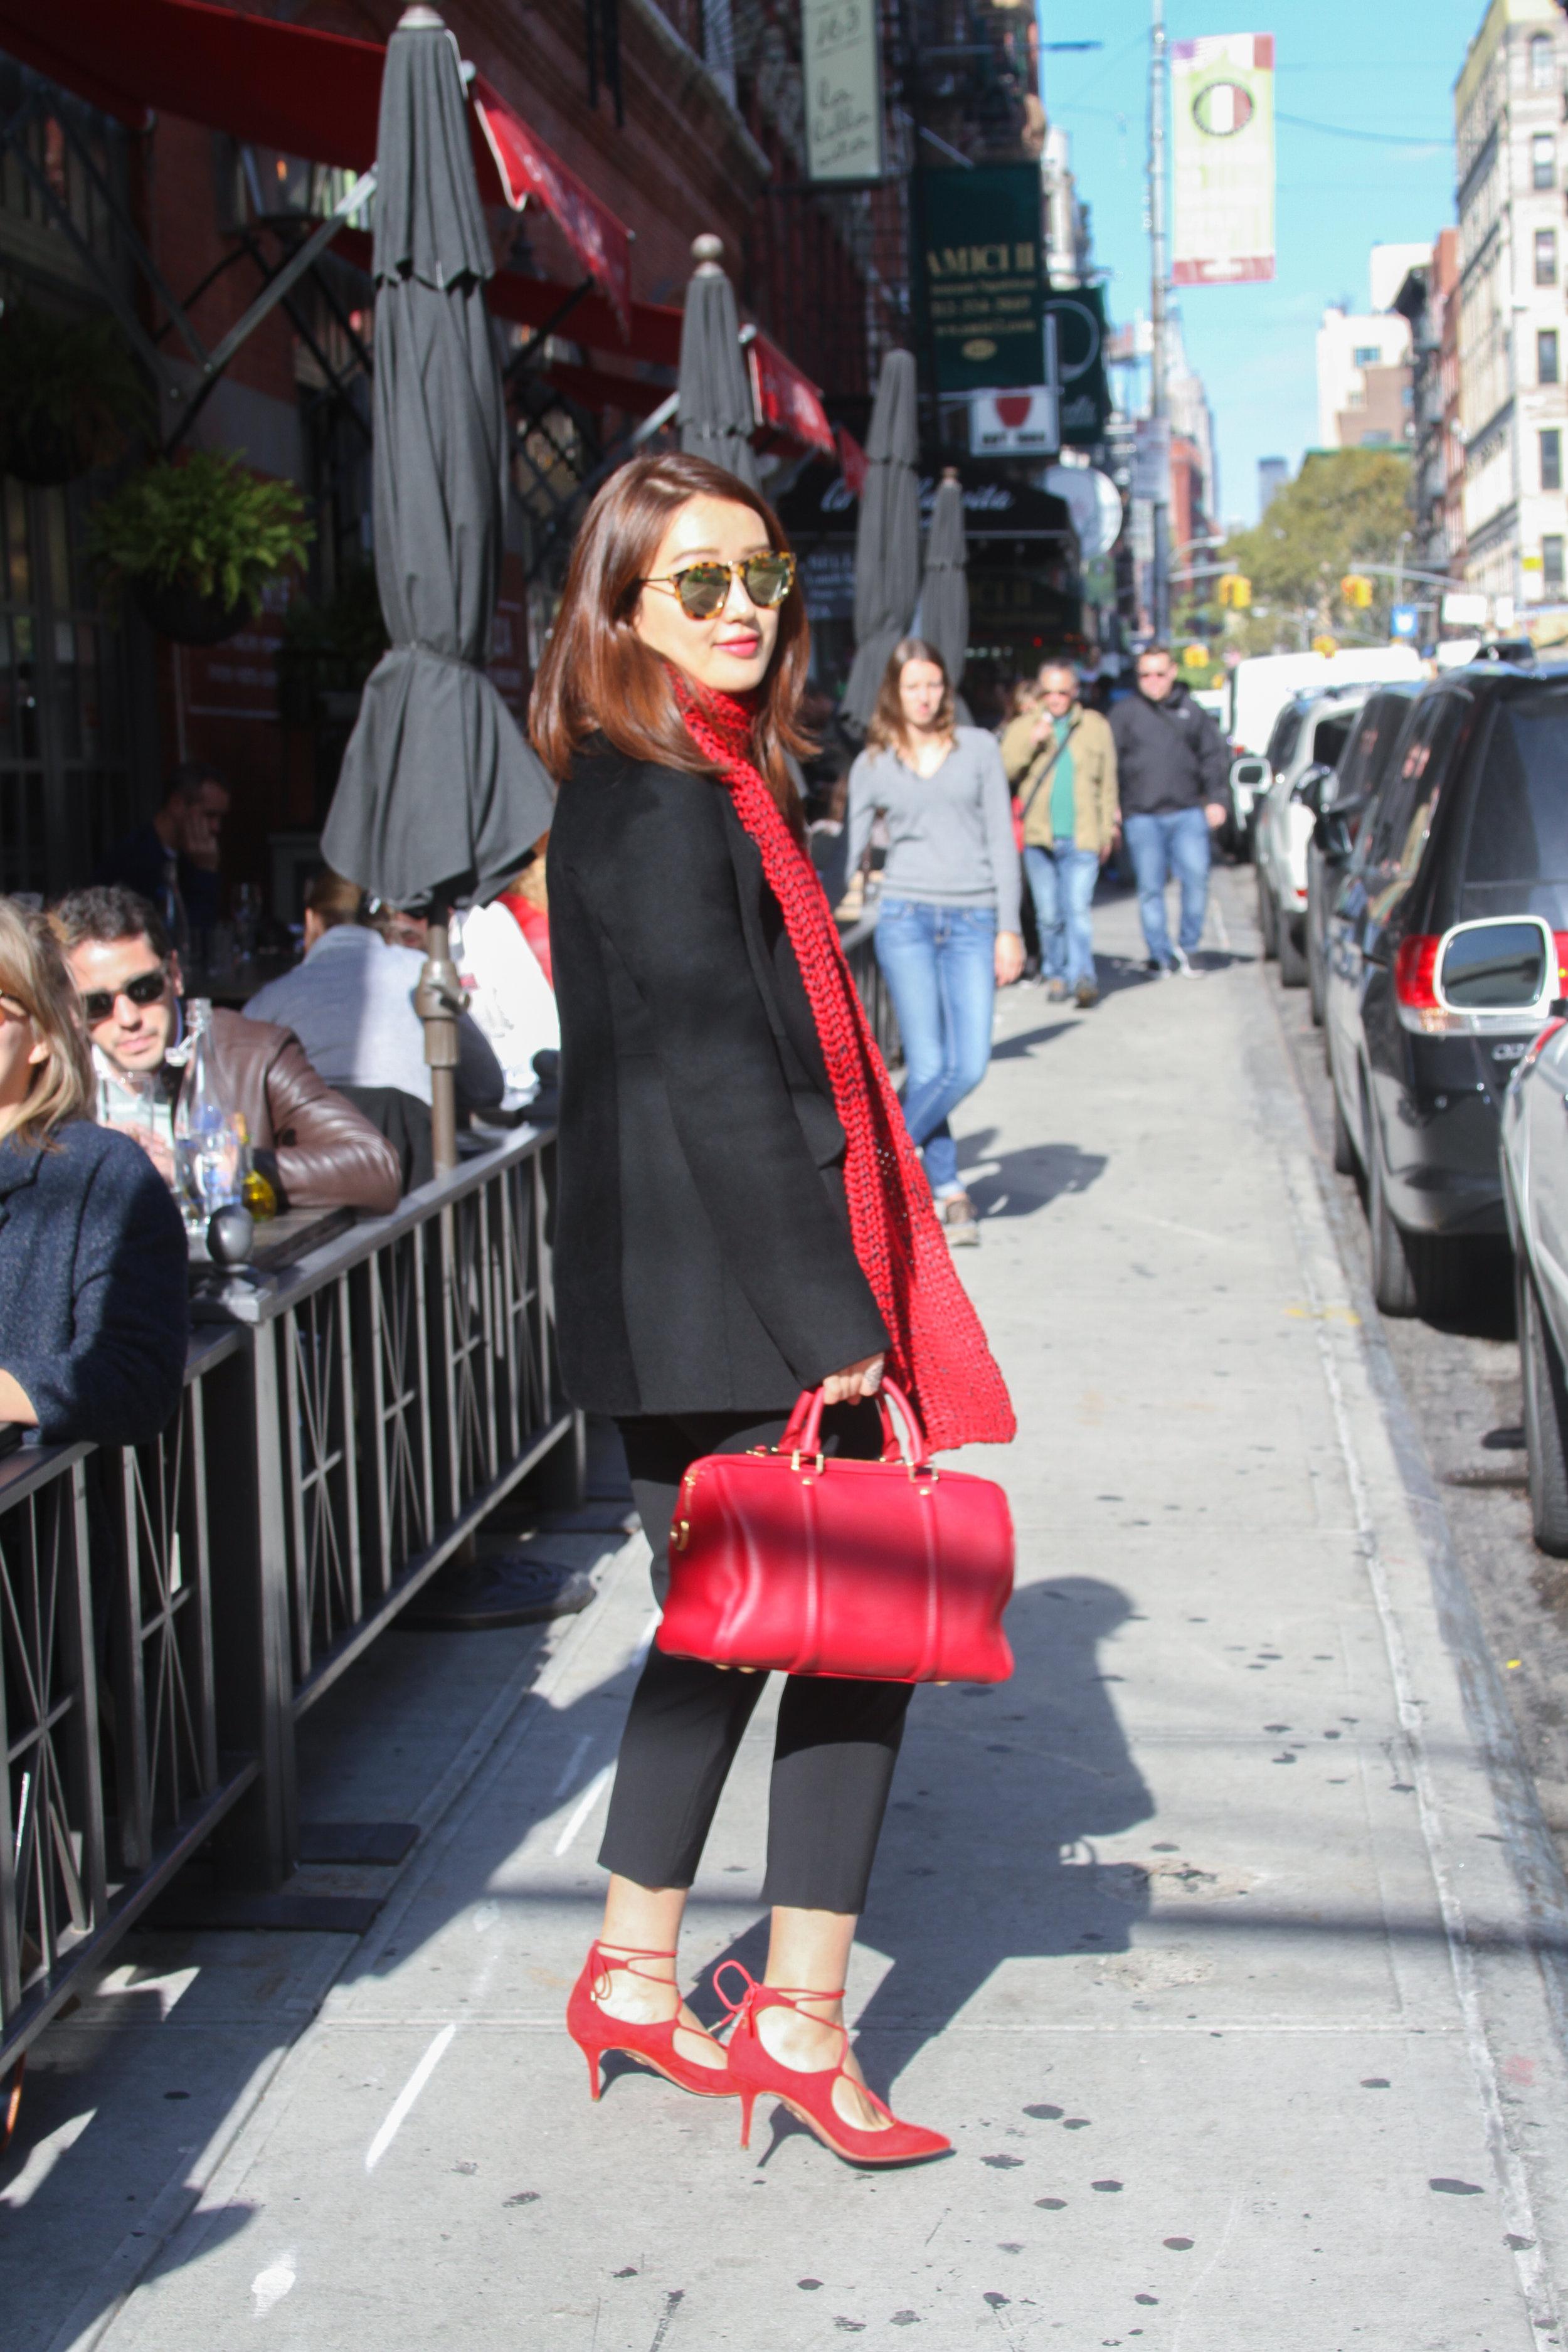 junelemongirl, june lemon girl, fashion blogger, street fashion, red scarf fashion, black coat fashion, red scarf street style, nyc street fashion, red lace up pumps, lace up pumps, red satchel, black cropped pants, red over black, aquazzura